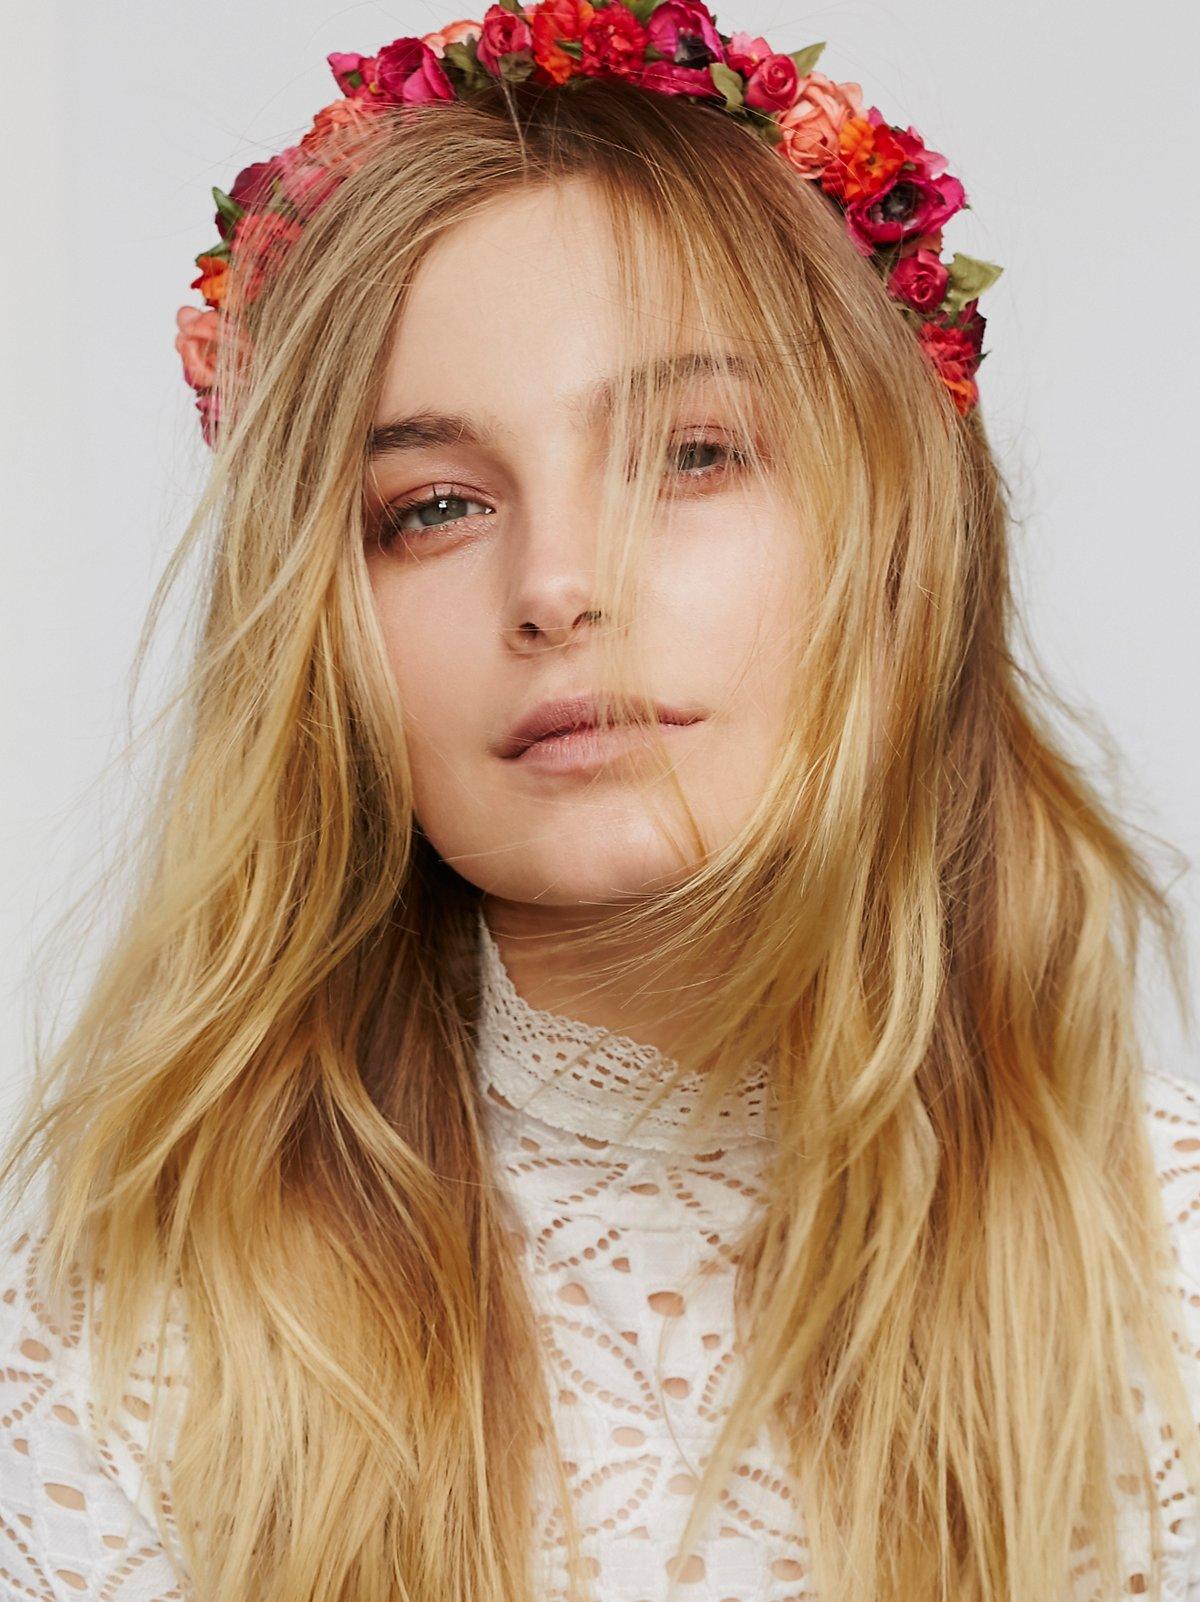 Frida Floral Headband